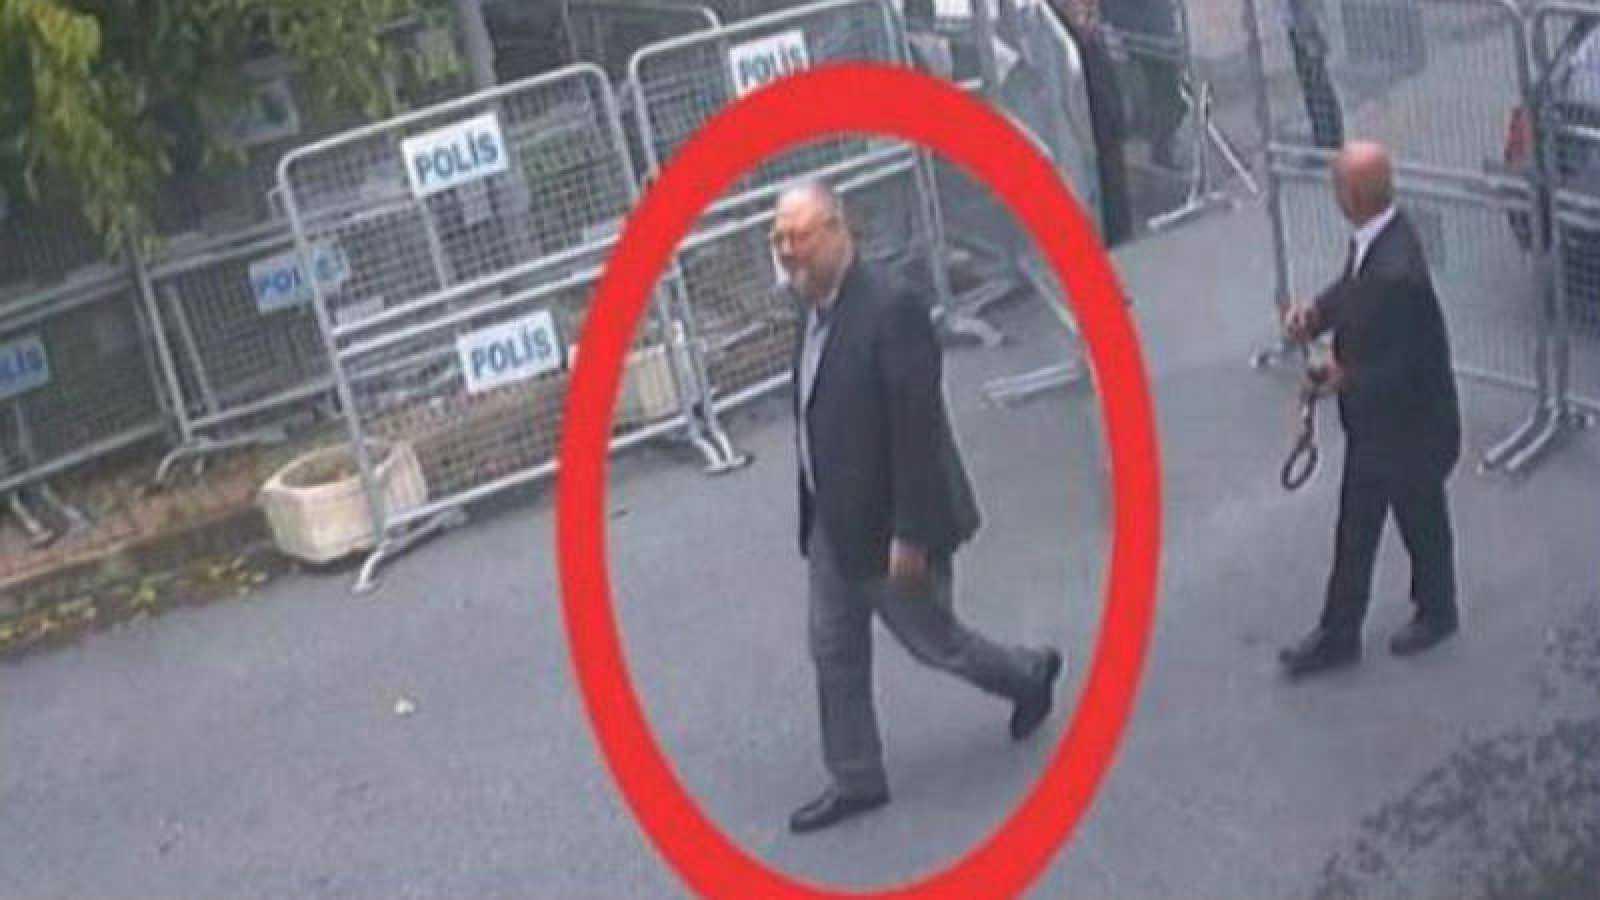 Jamal Khashoggi llega al consulado saudí en Estambul el 2 de octubre